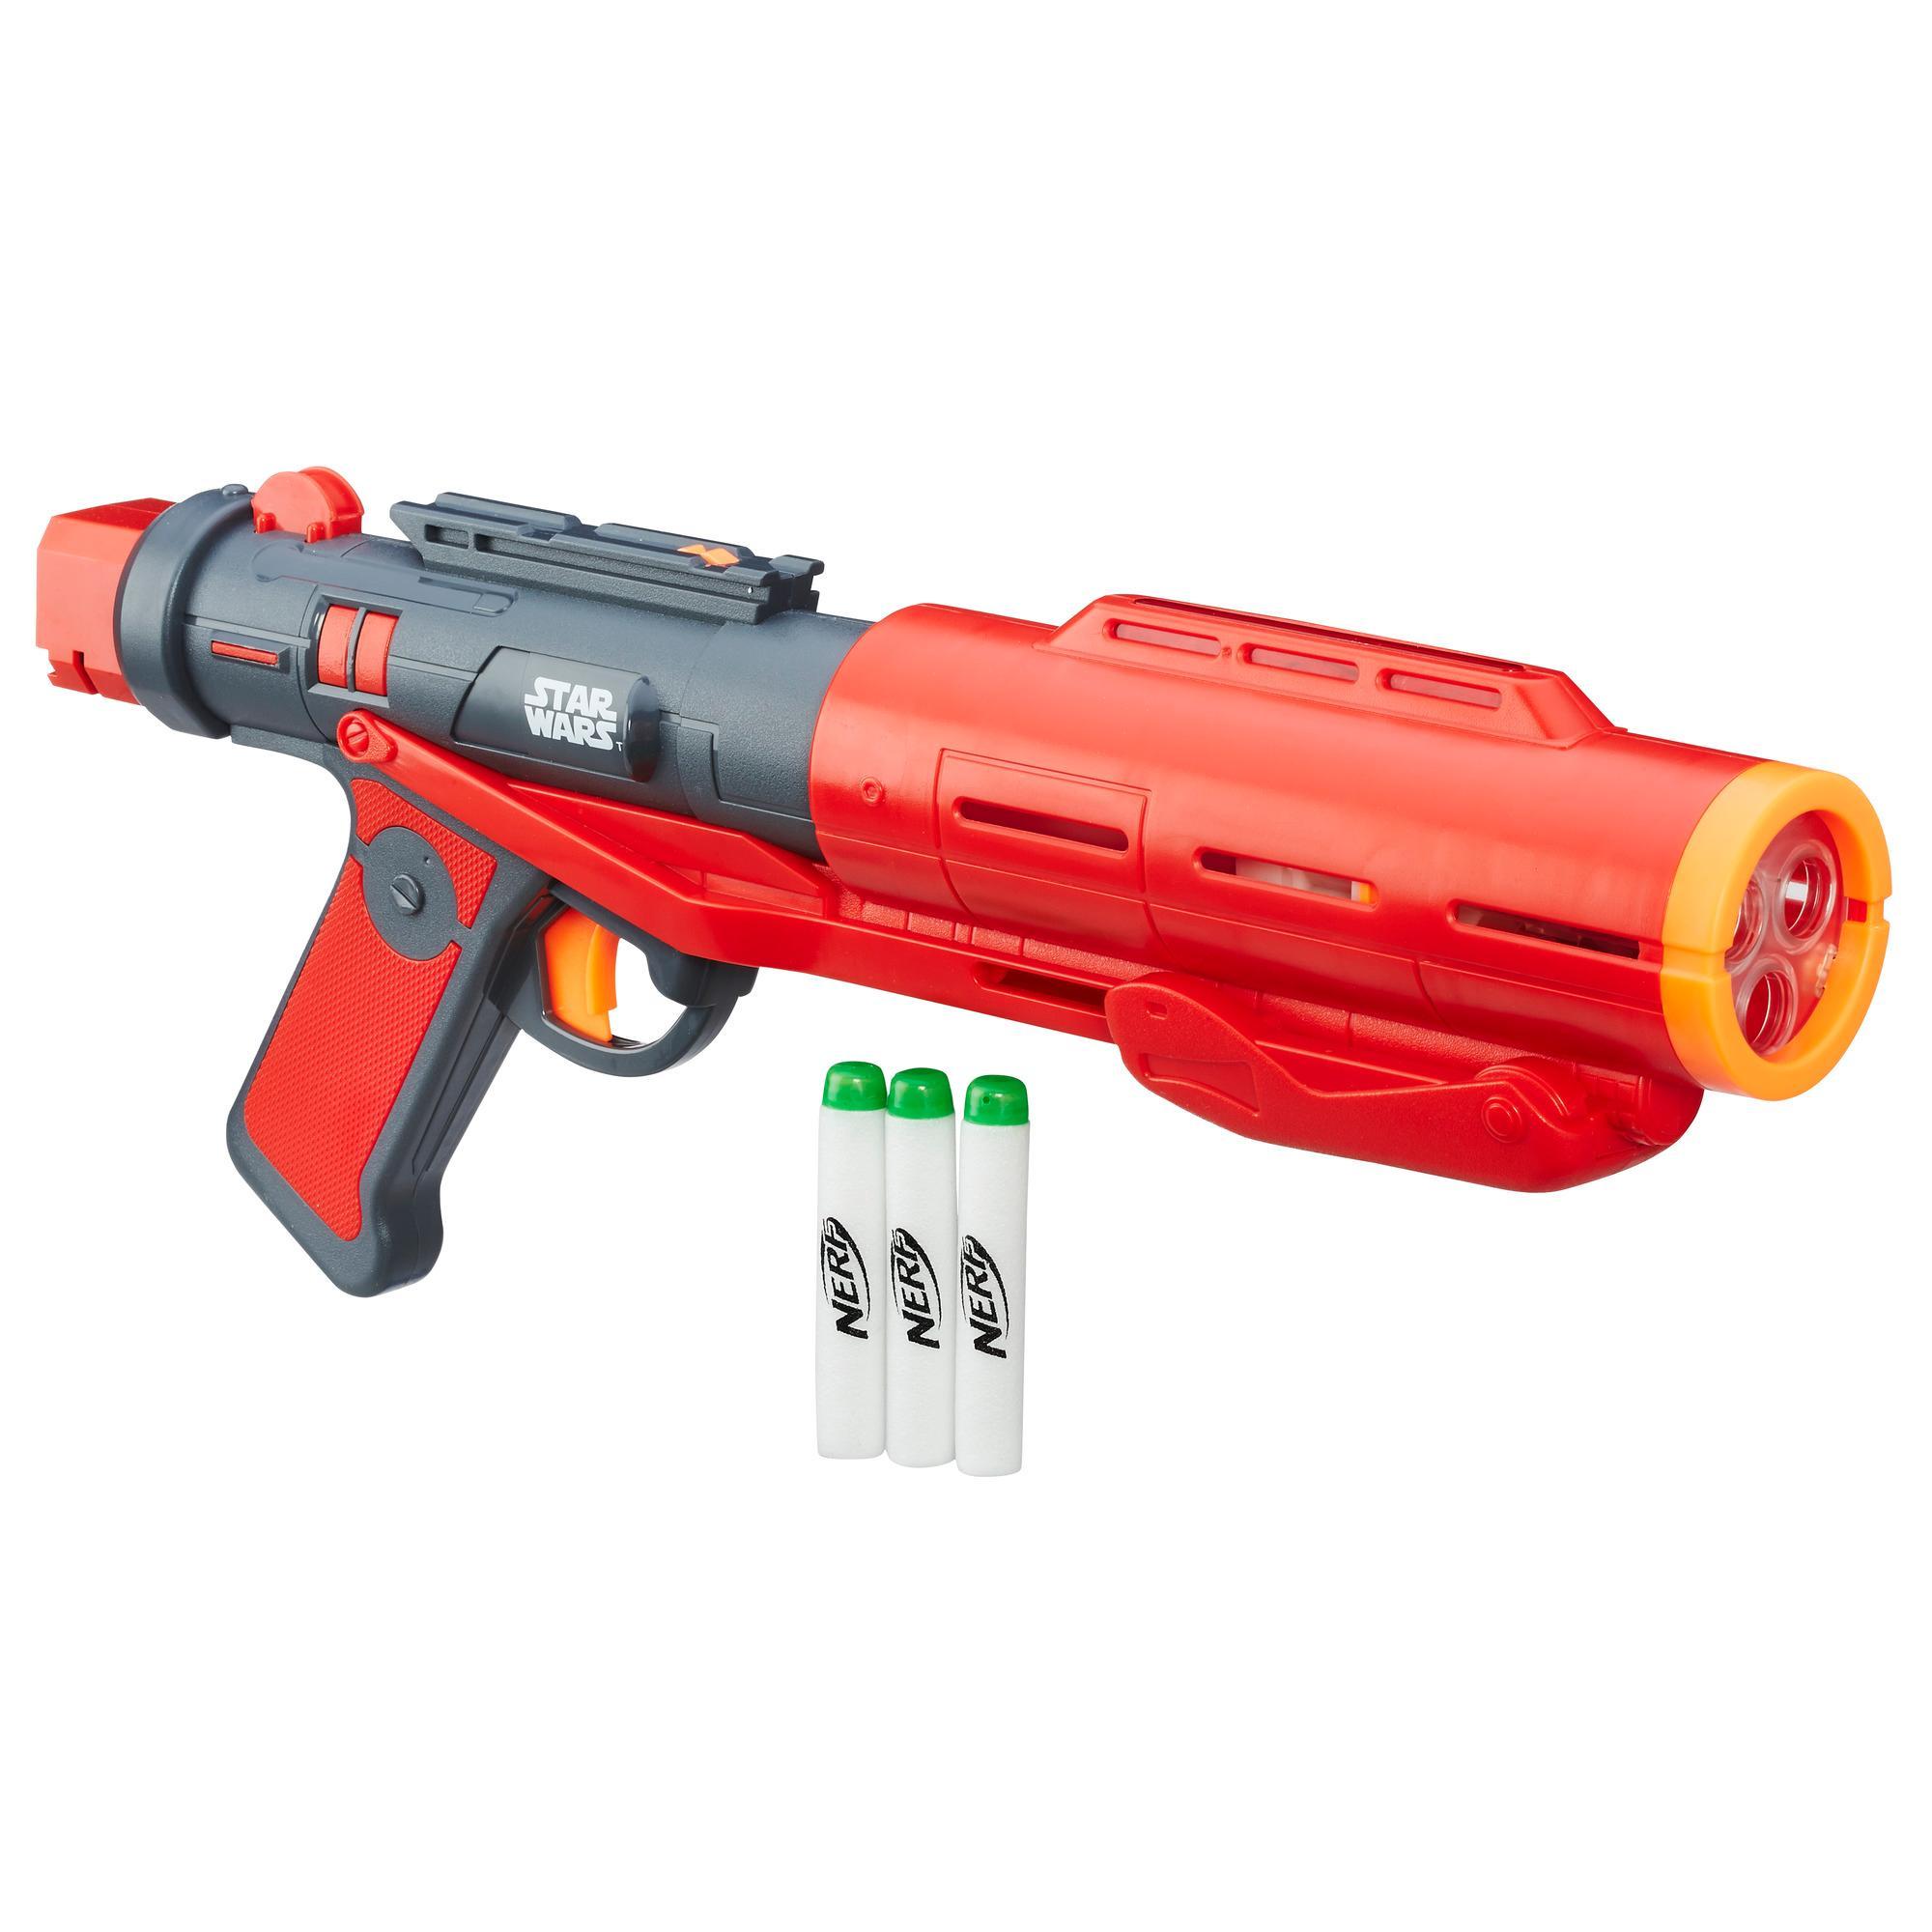 Star Wars Rogue One Nerf - Blaster de luxe de Death Trooper impérial